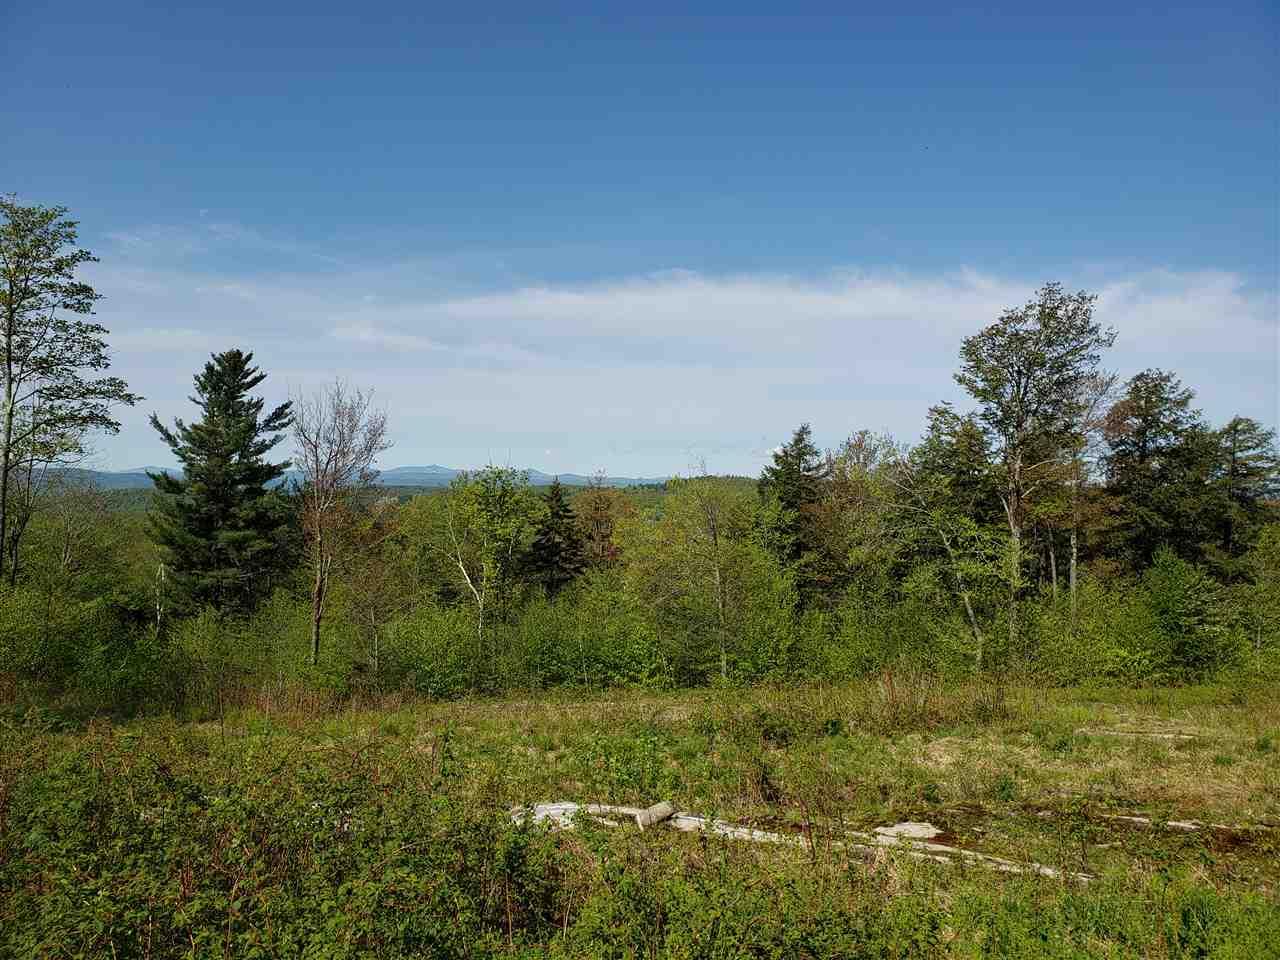 Sharon VT 63 acres of Land for sale